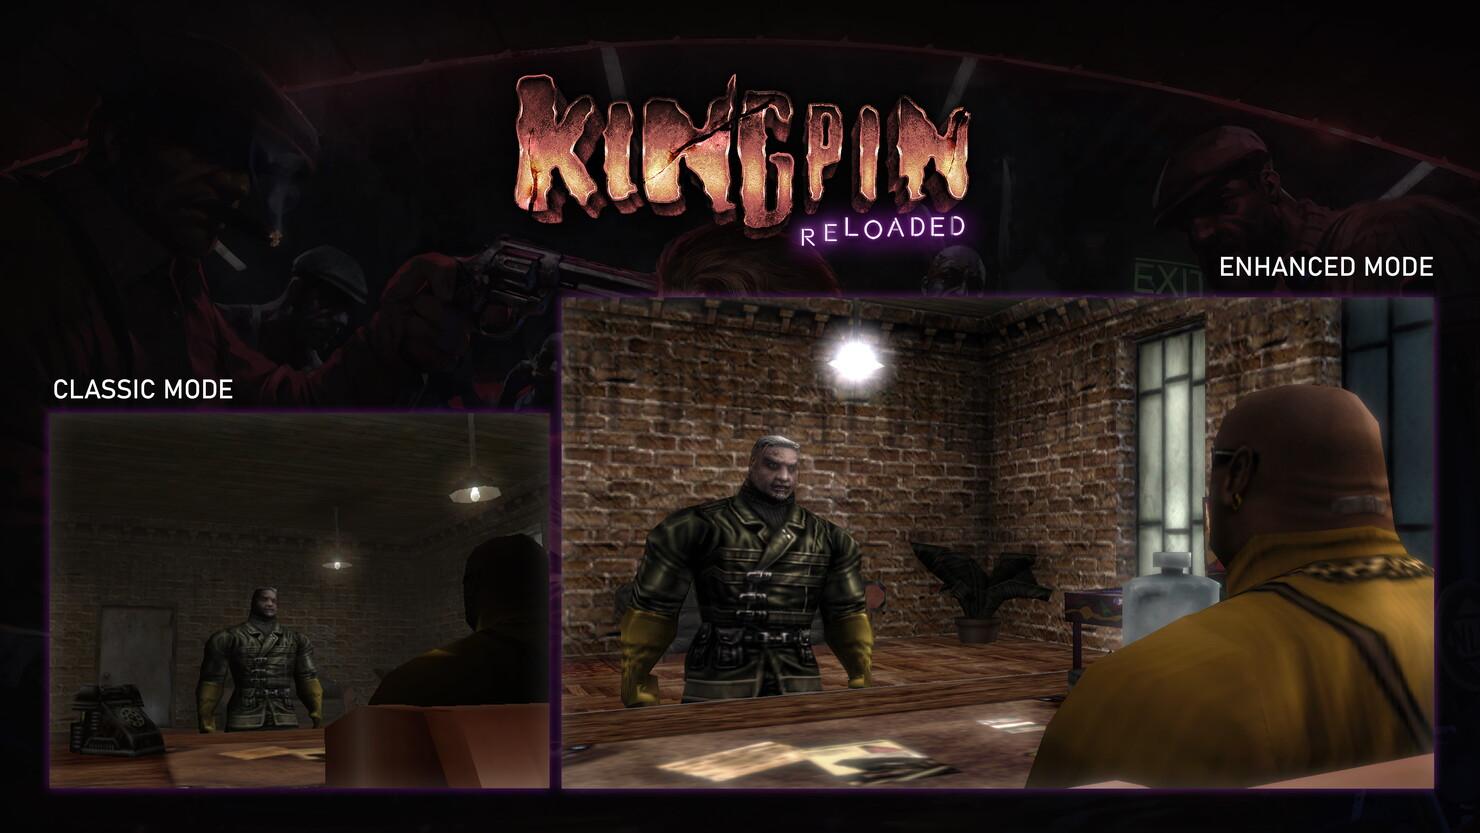 Кадры из игры Kingpin: Reloaded